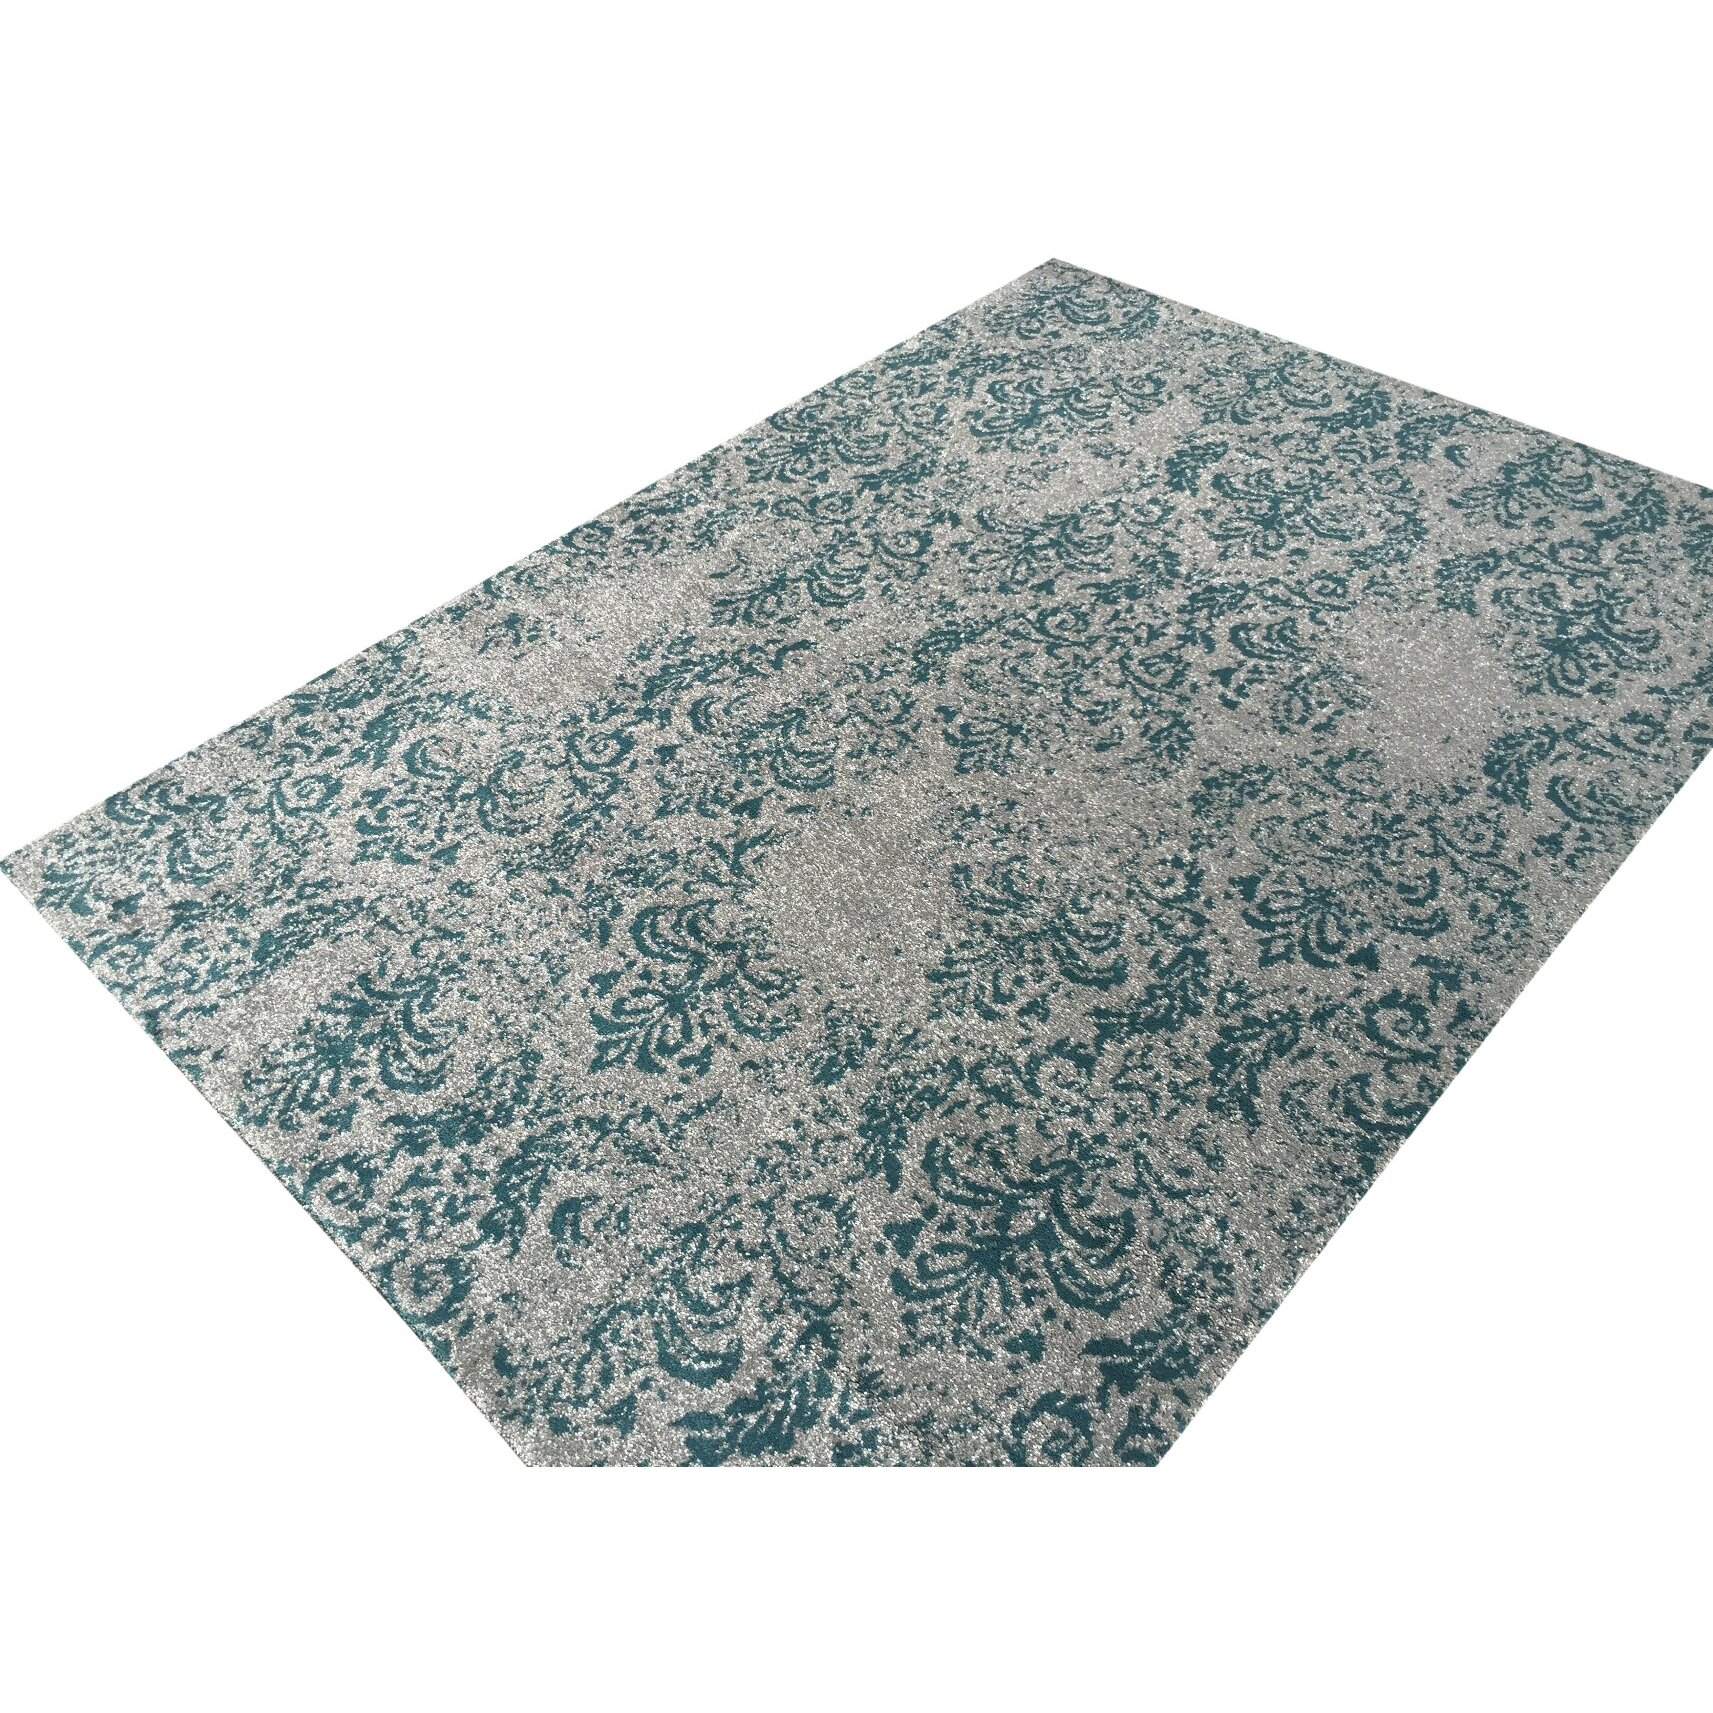 Rugnur Zahra Teal/Blue Indoor/Outdoor Area Rug